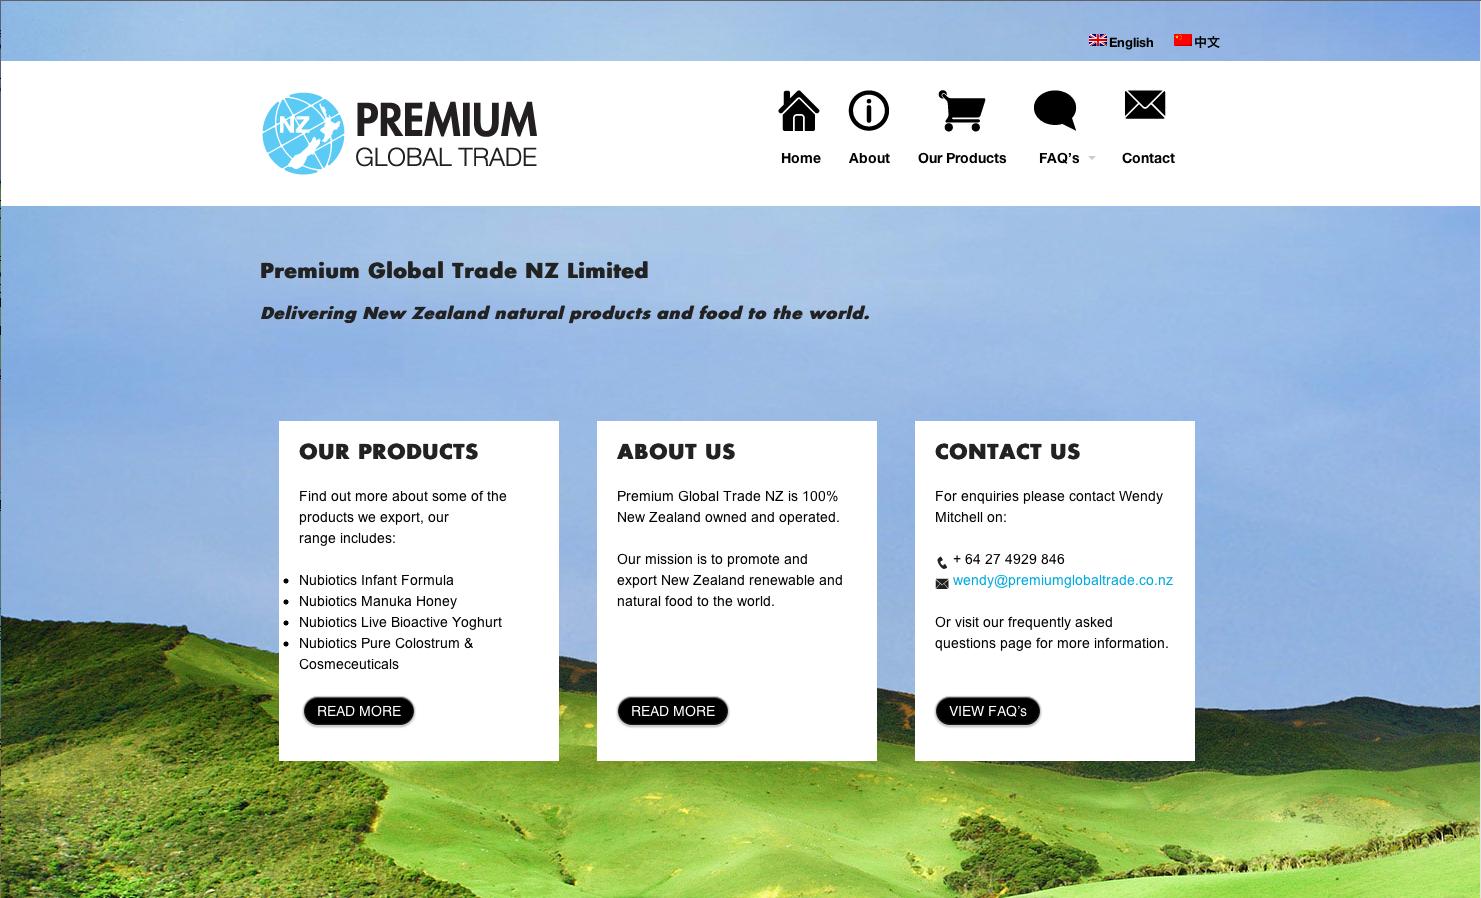 Premium Global Trade NZ